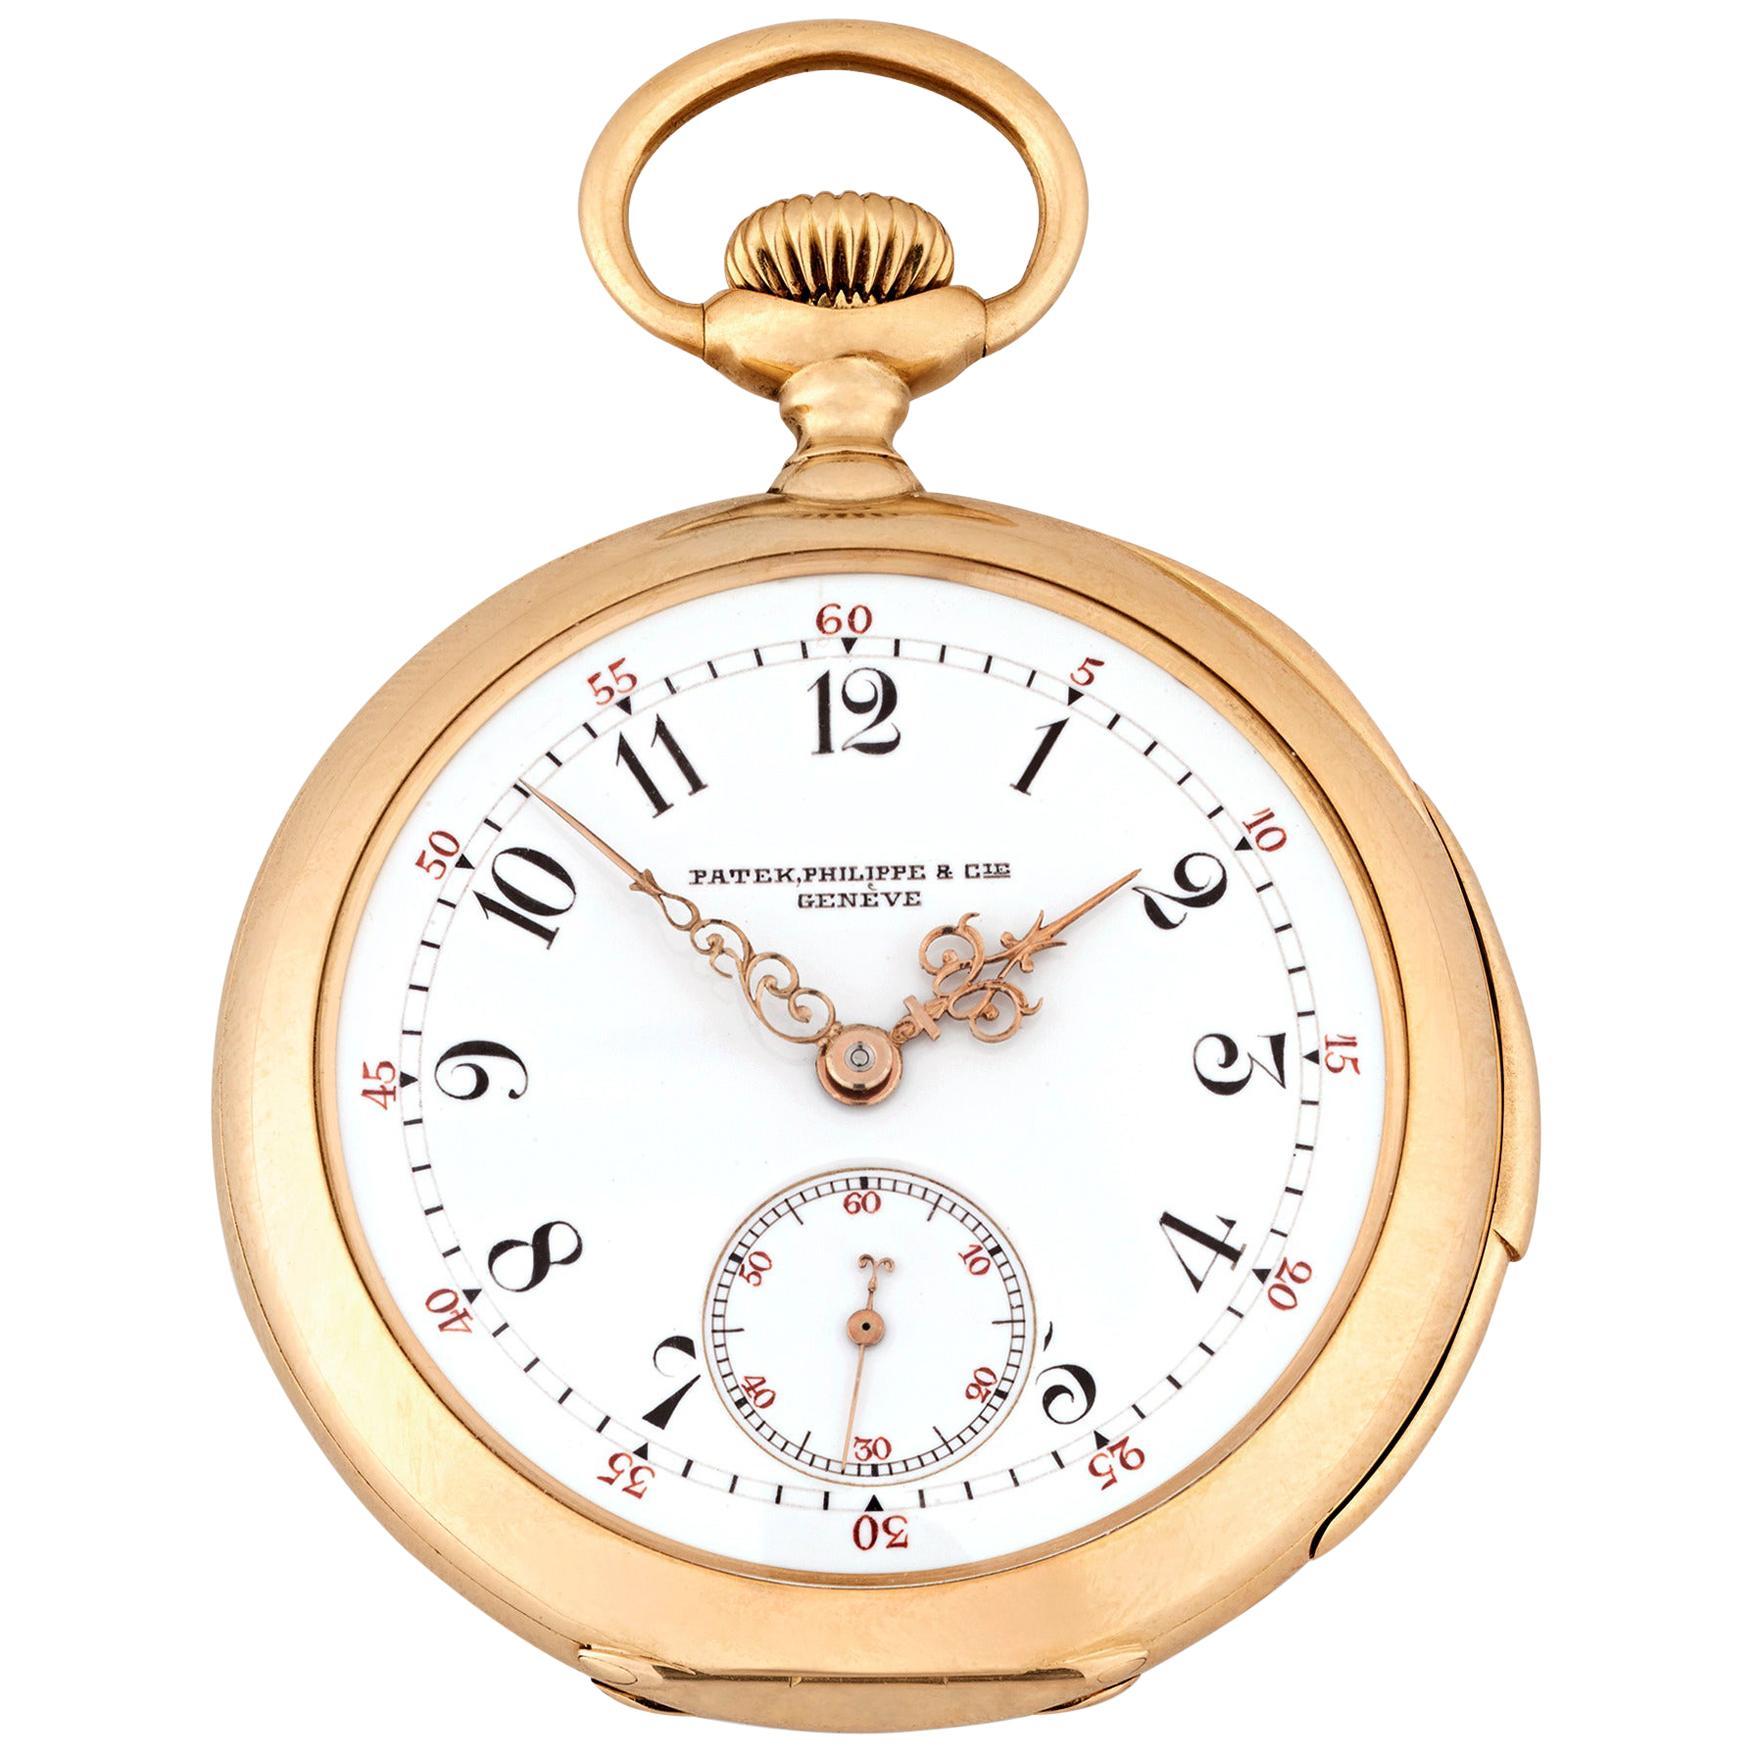 Patek Philippe Five-Minute Repeater Pocket Watch